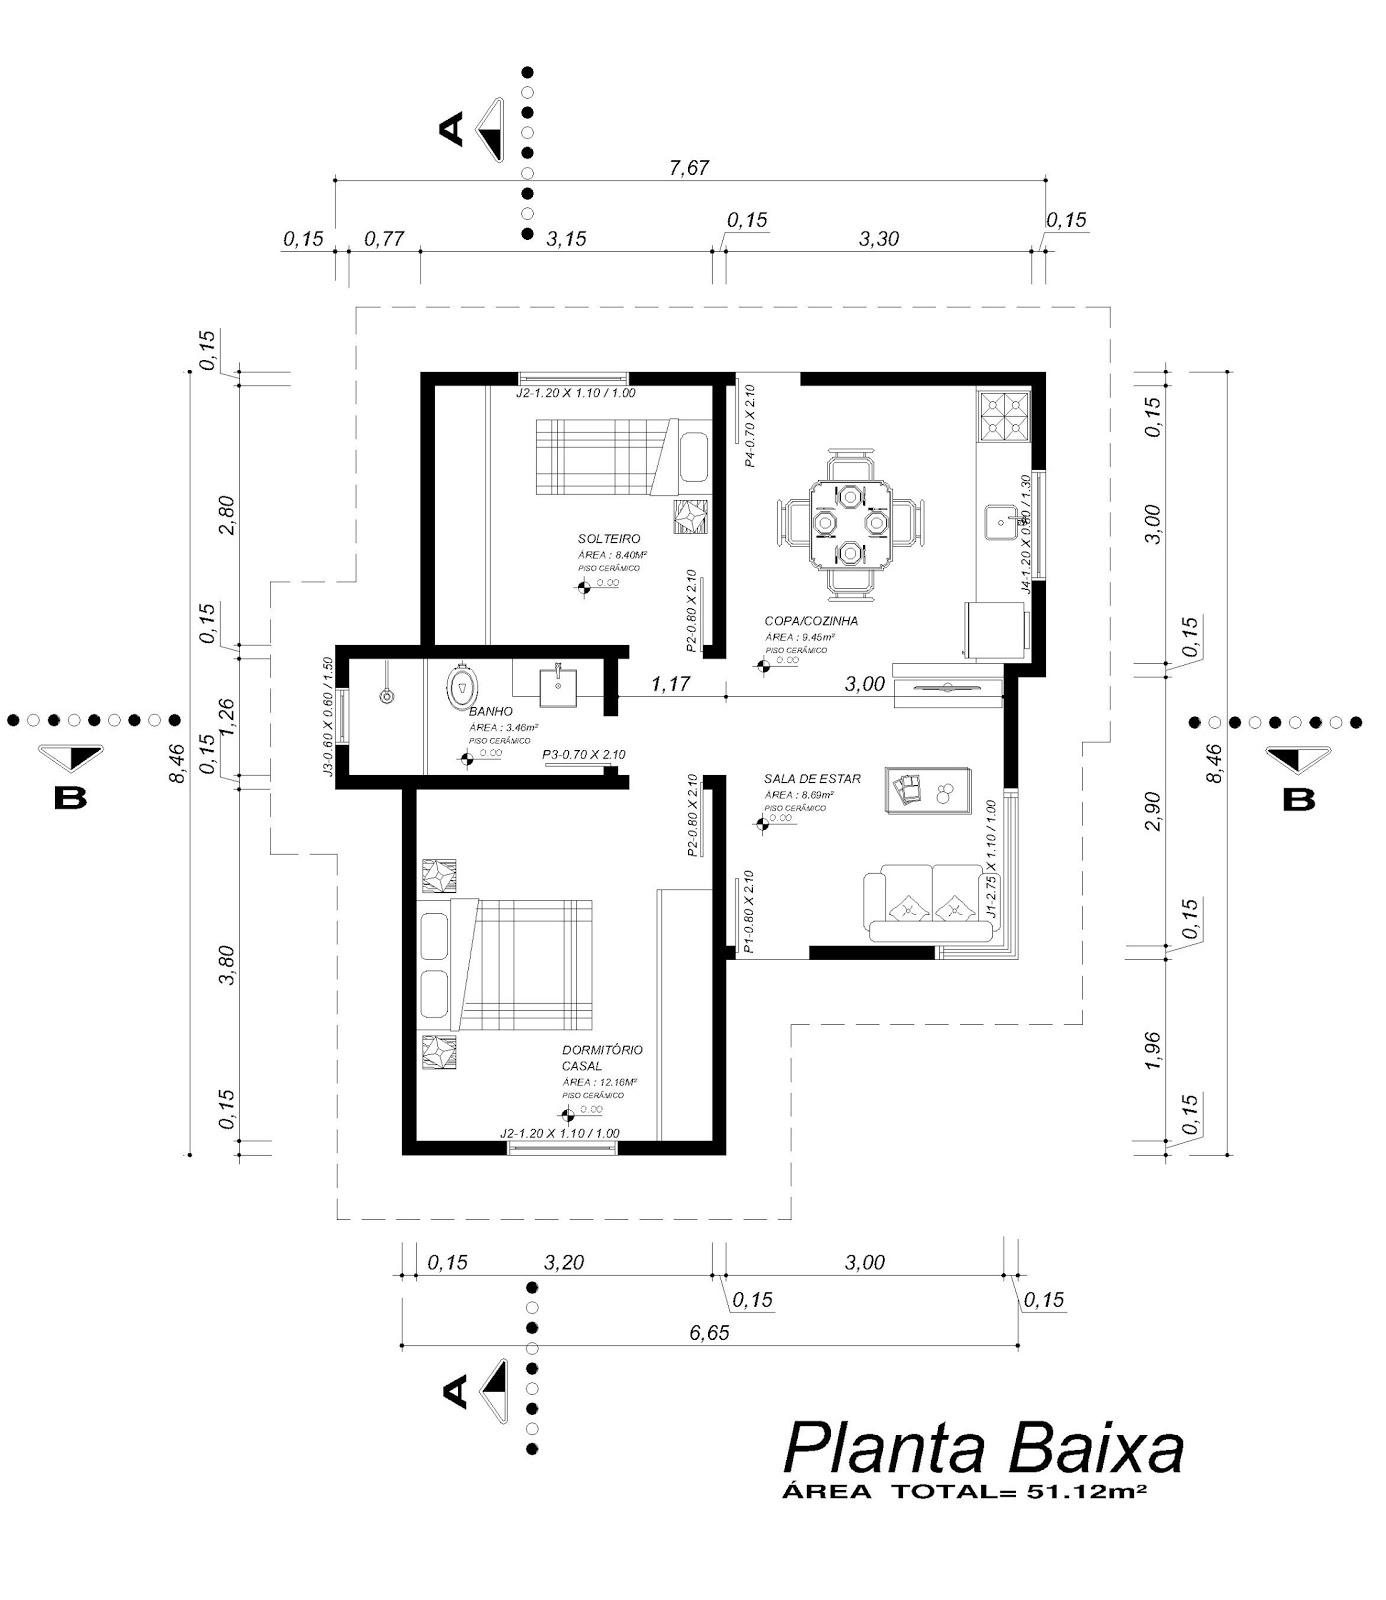 Fachadas de Casas Barbara Borges Projetos 3D #666666 1386 1600